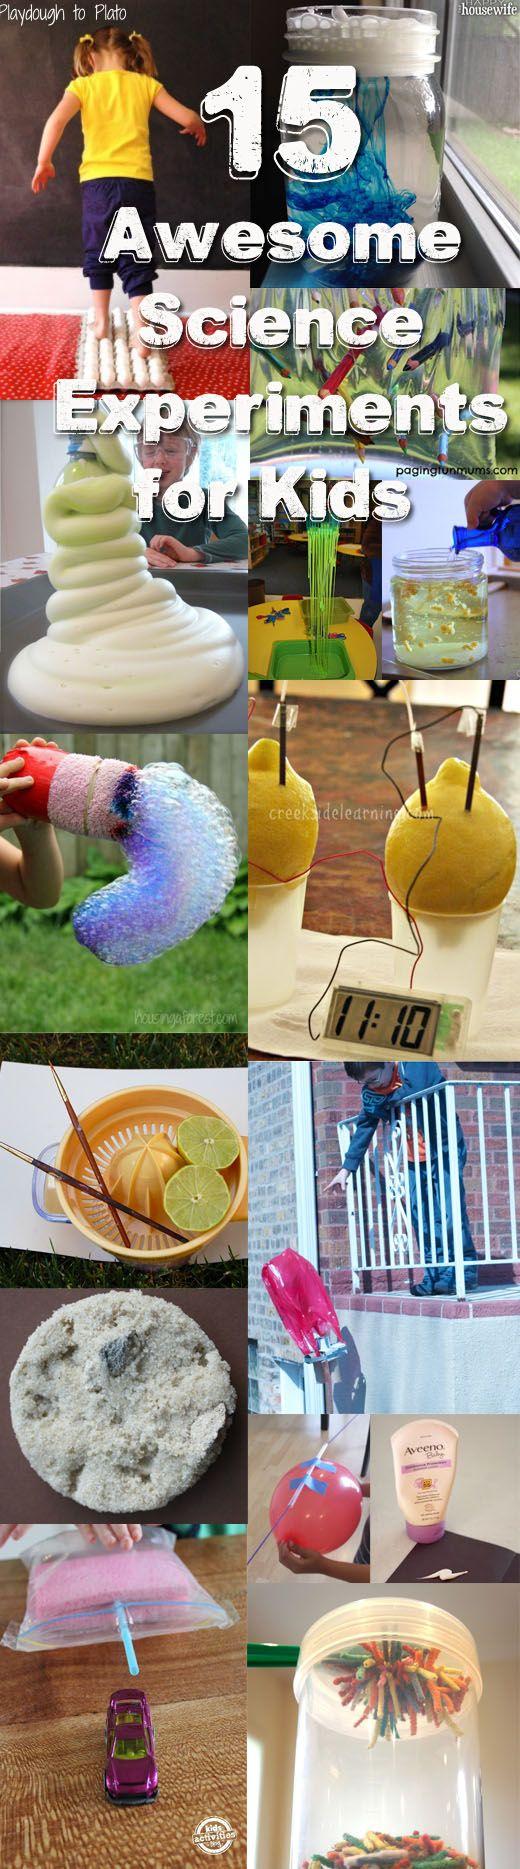 289 best kid craft make it crafty images on pinterest kid